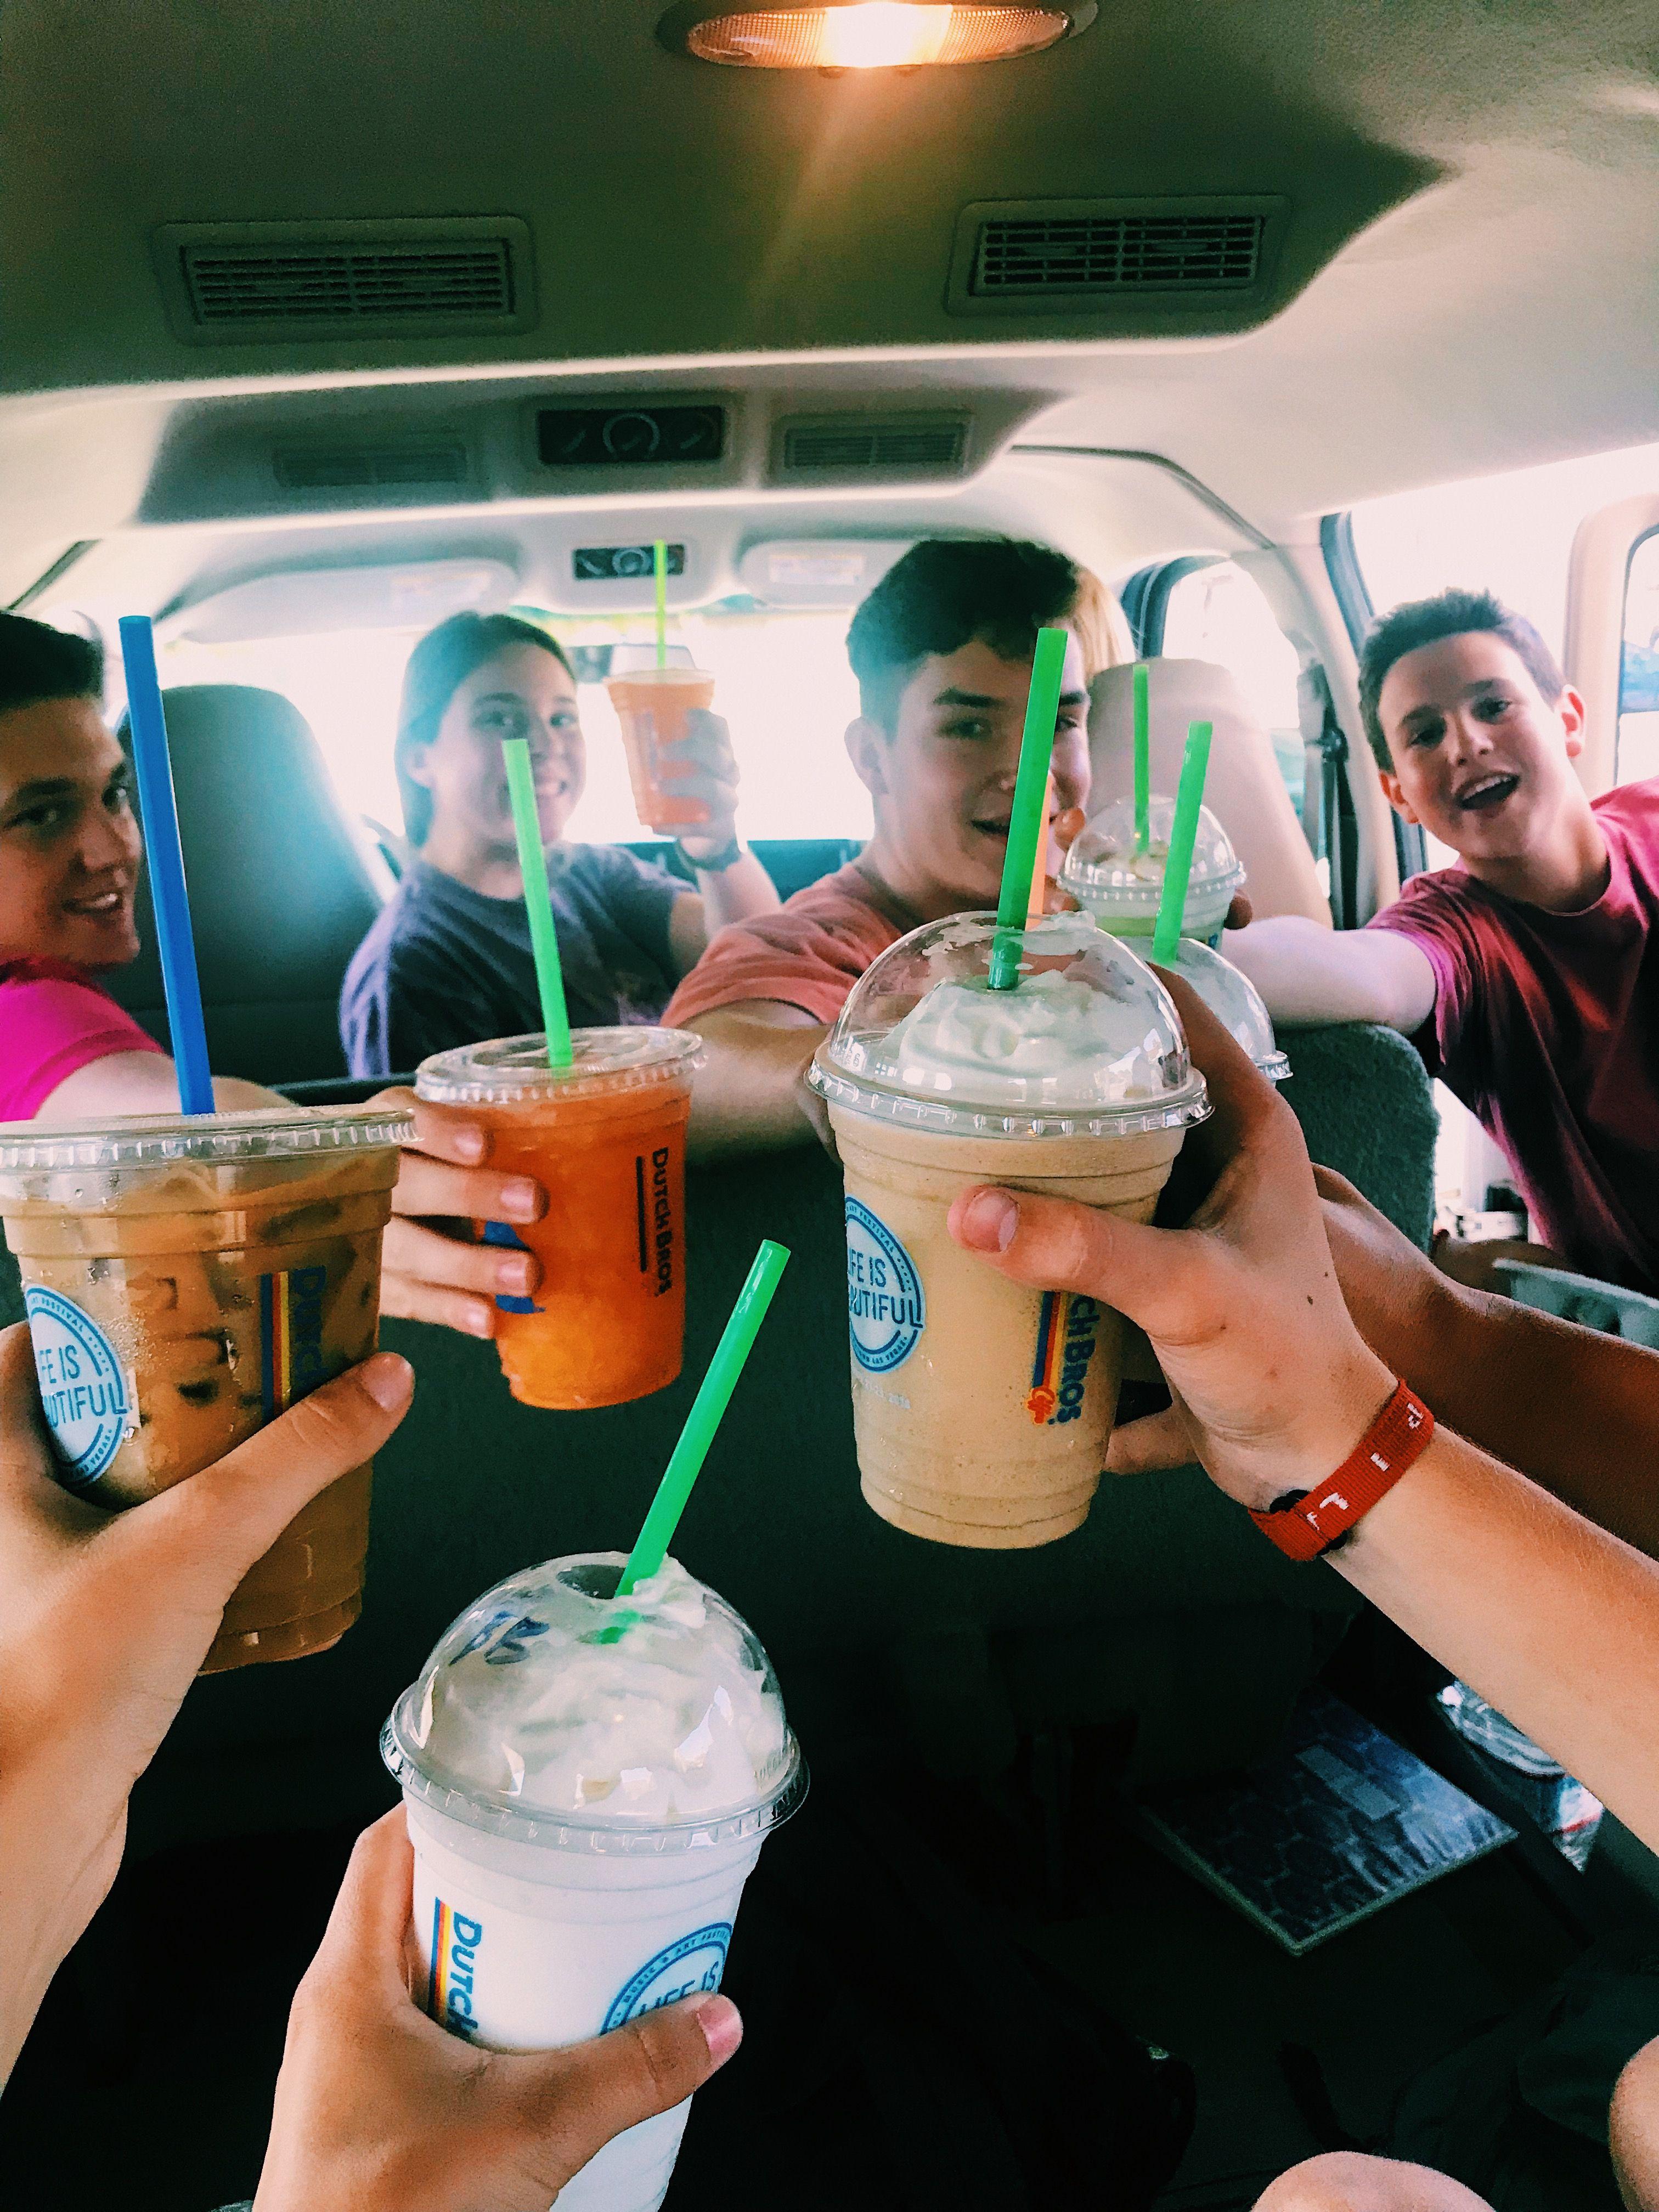 friends + dutch bros coffee #dutchbros